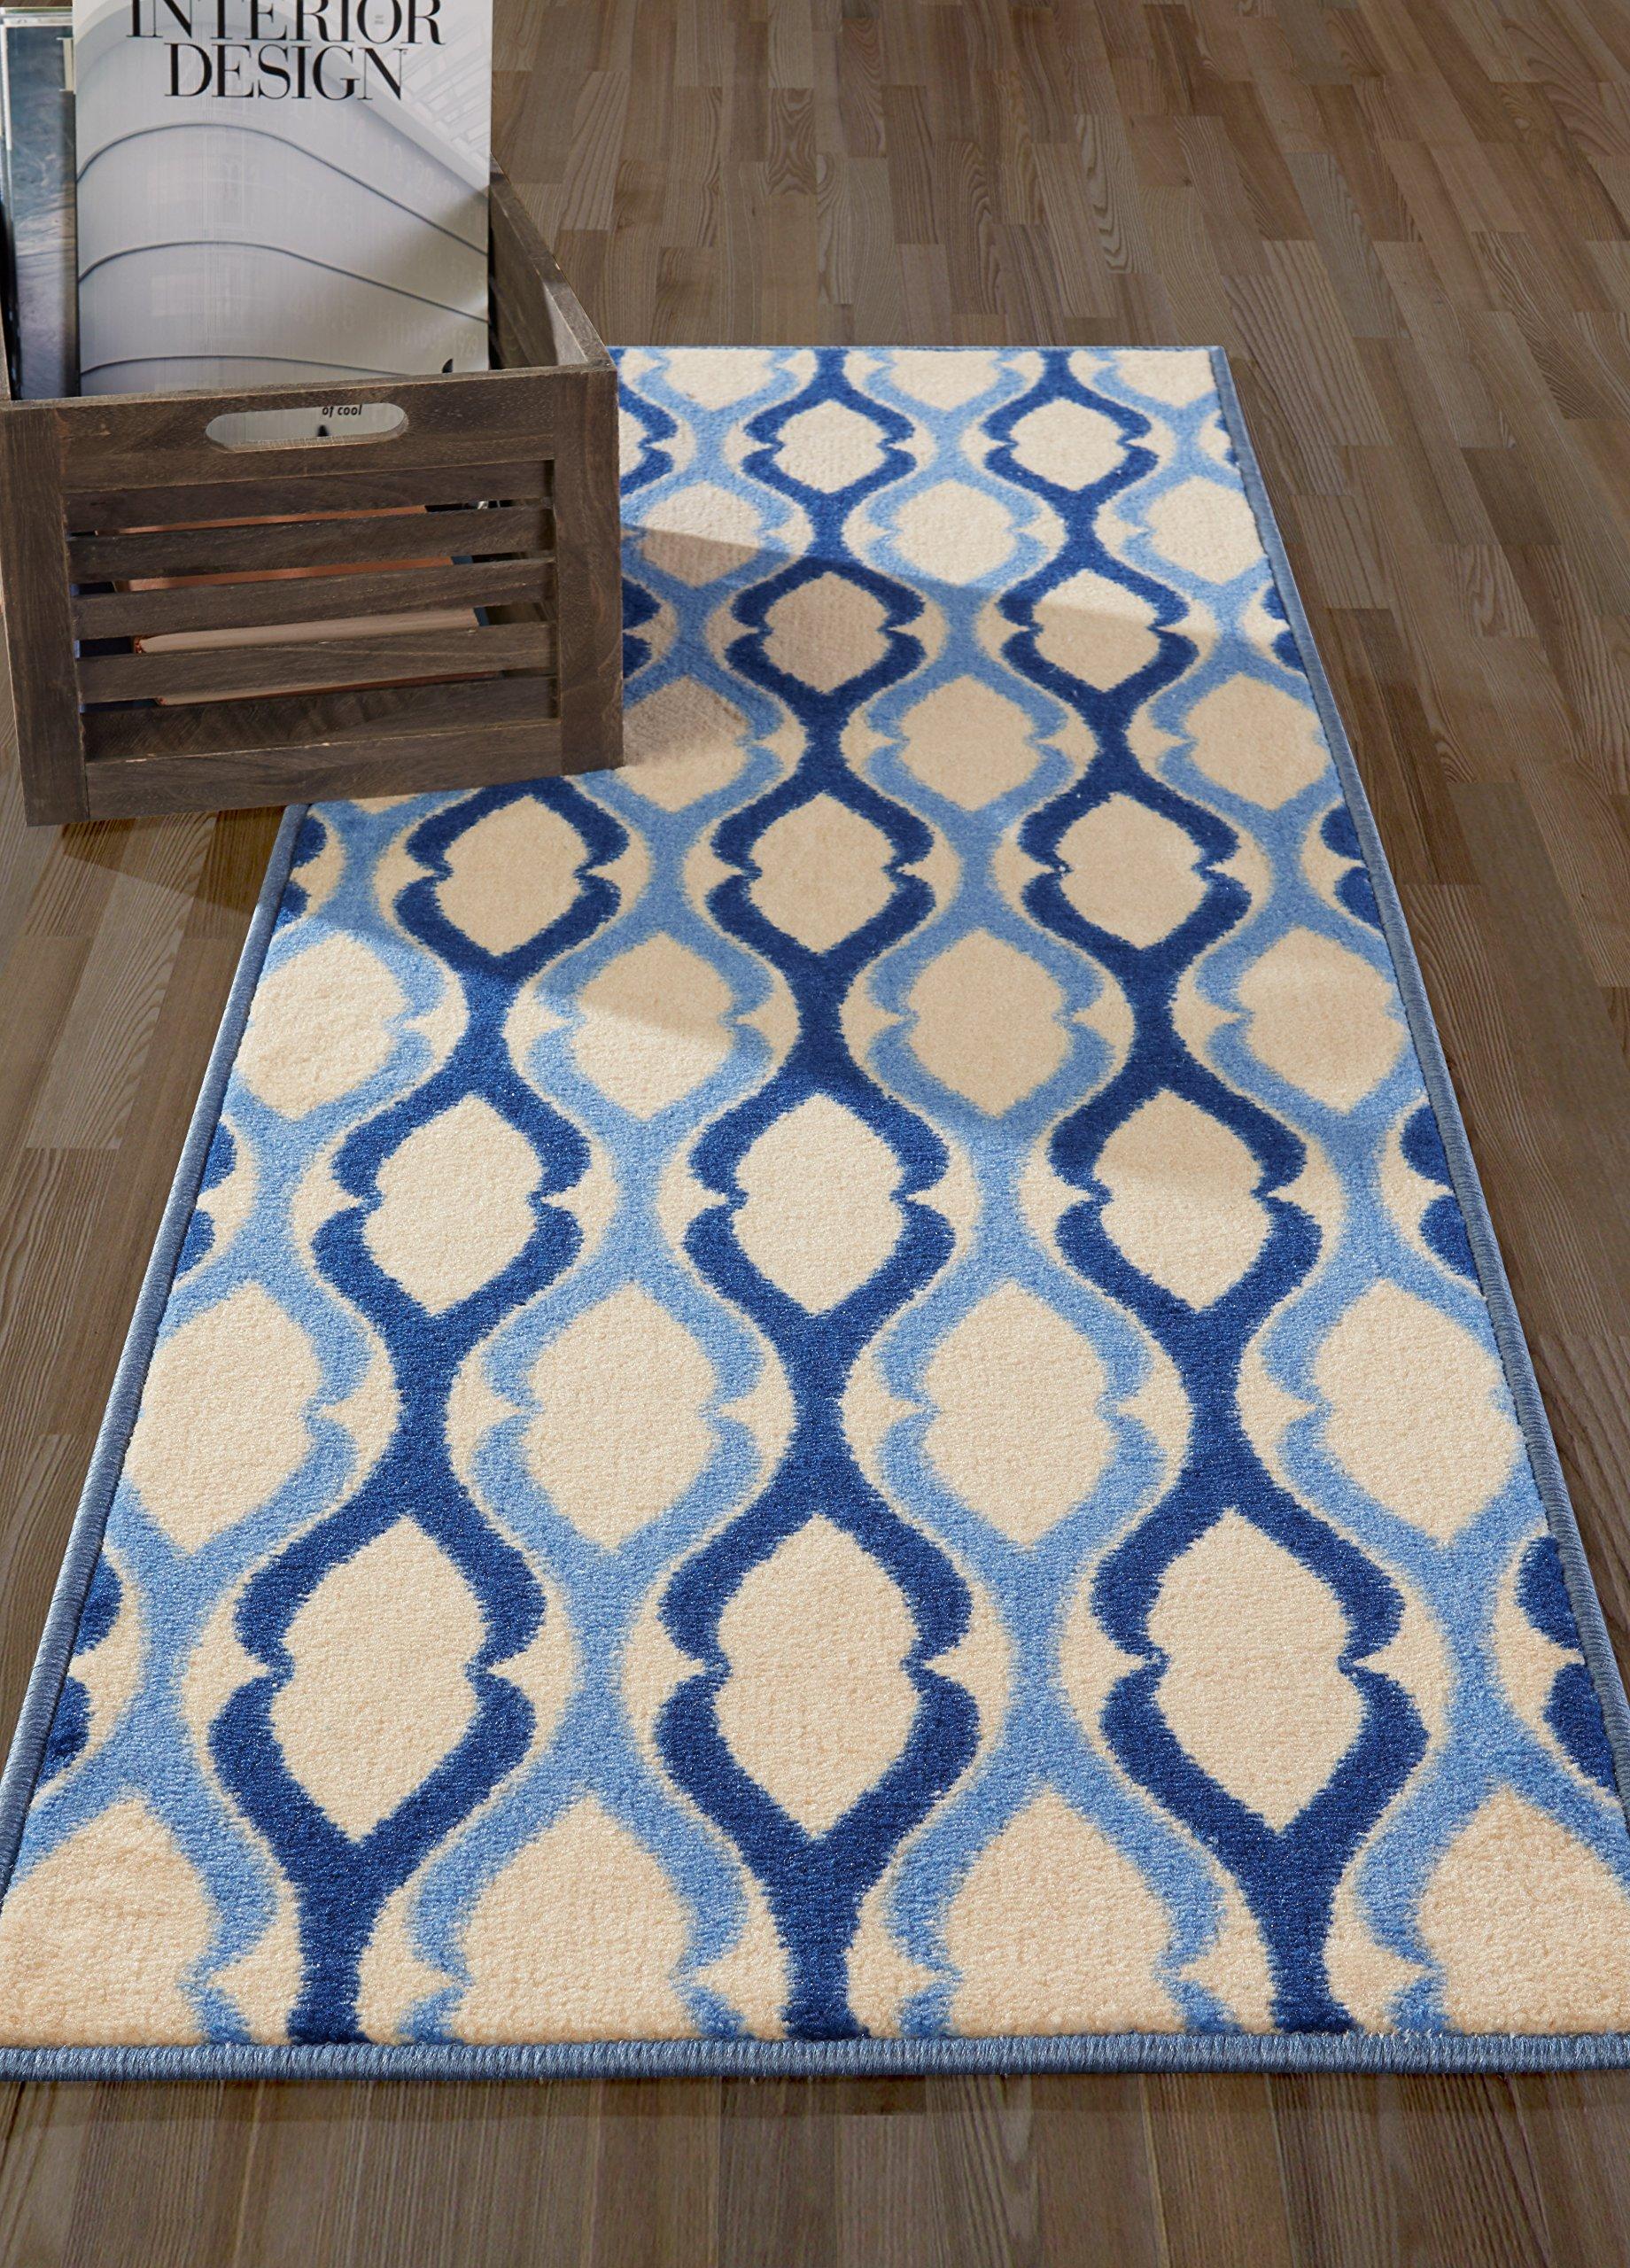 Moroccan Trellis Area Rug Runner Blue Hallway Carpet Non Slip Rubber ...